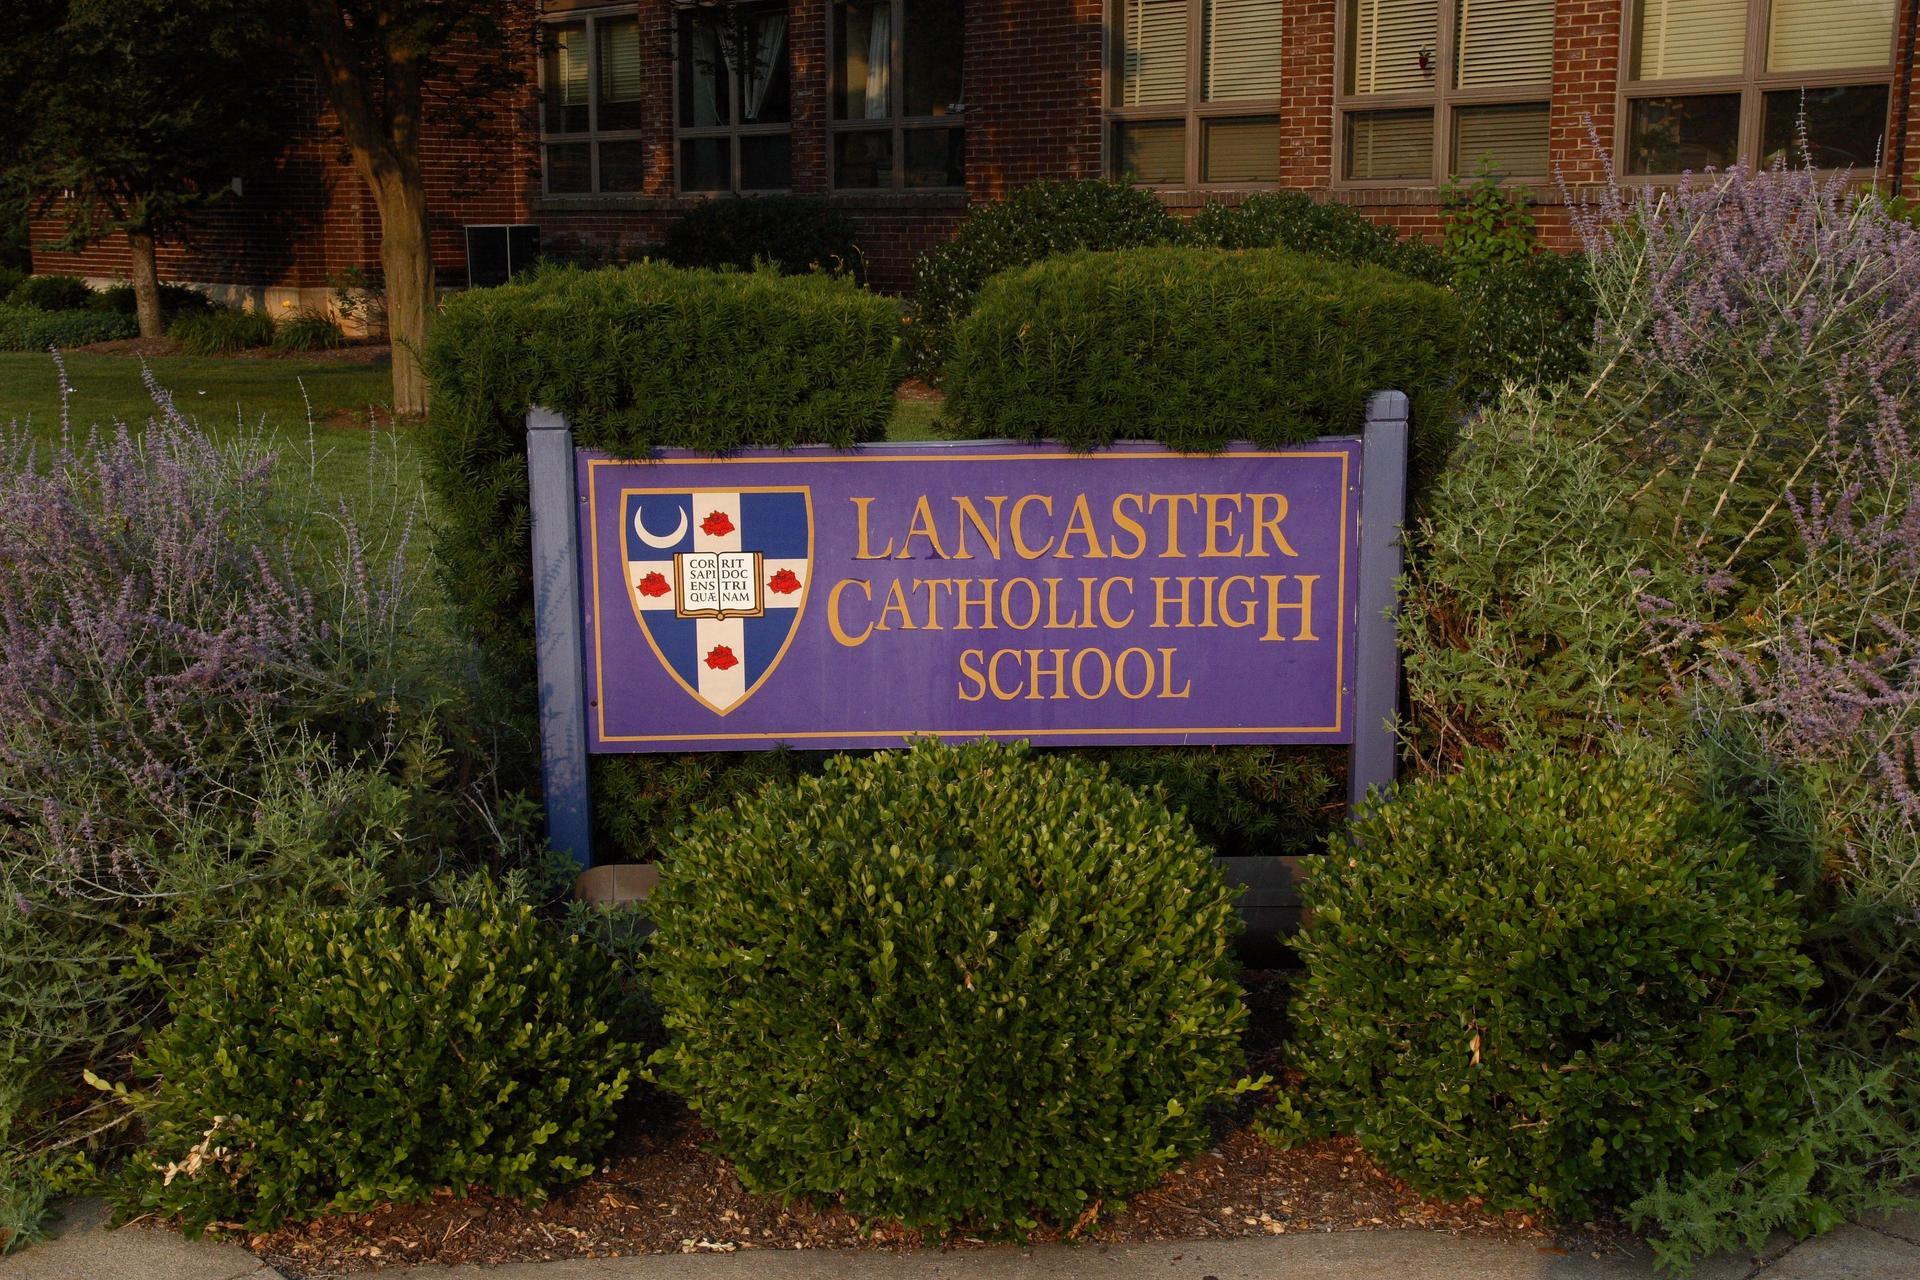 Rit Academic Calendar 2020-21 Lancaster Catholic High School | Visit LCHS | Catholic High School